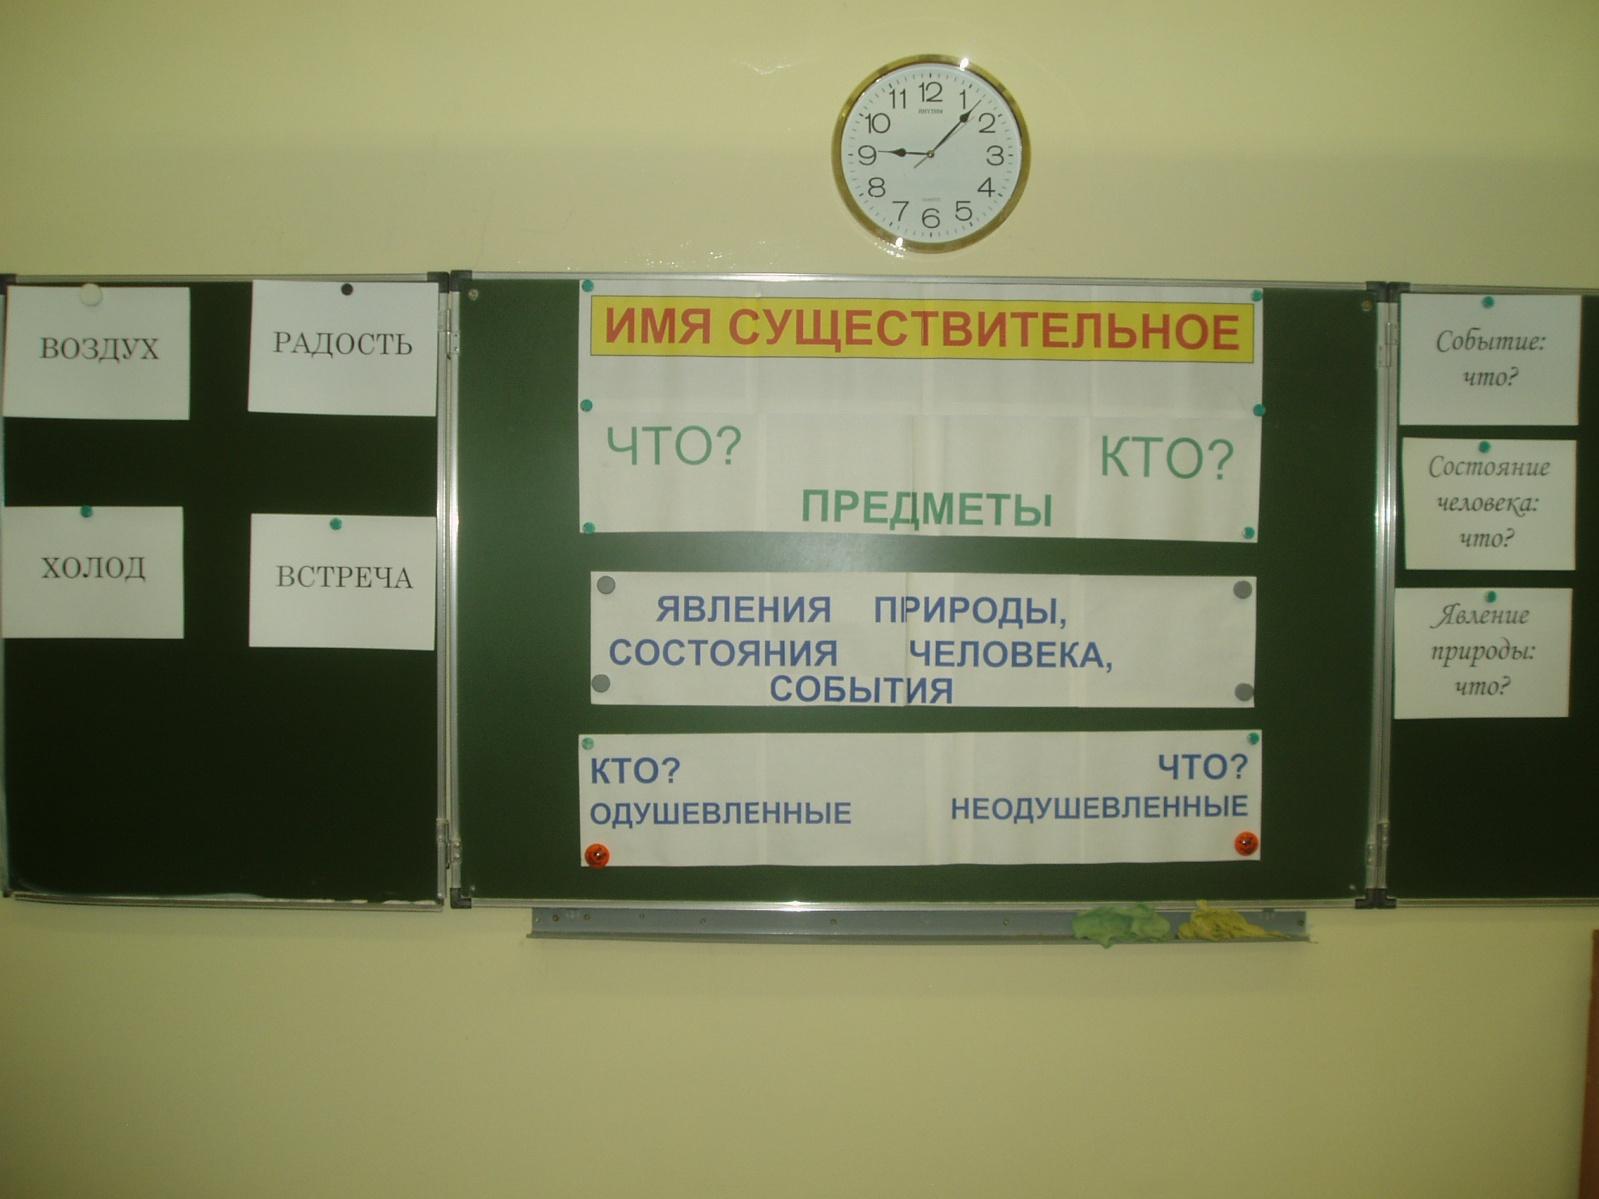 C:\Users\Эдик\Desktop\1кл. откр. ур. рус.яз\P1010137.JPG